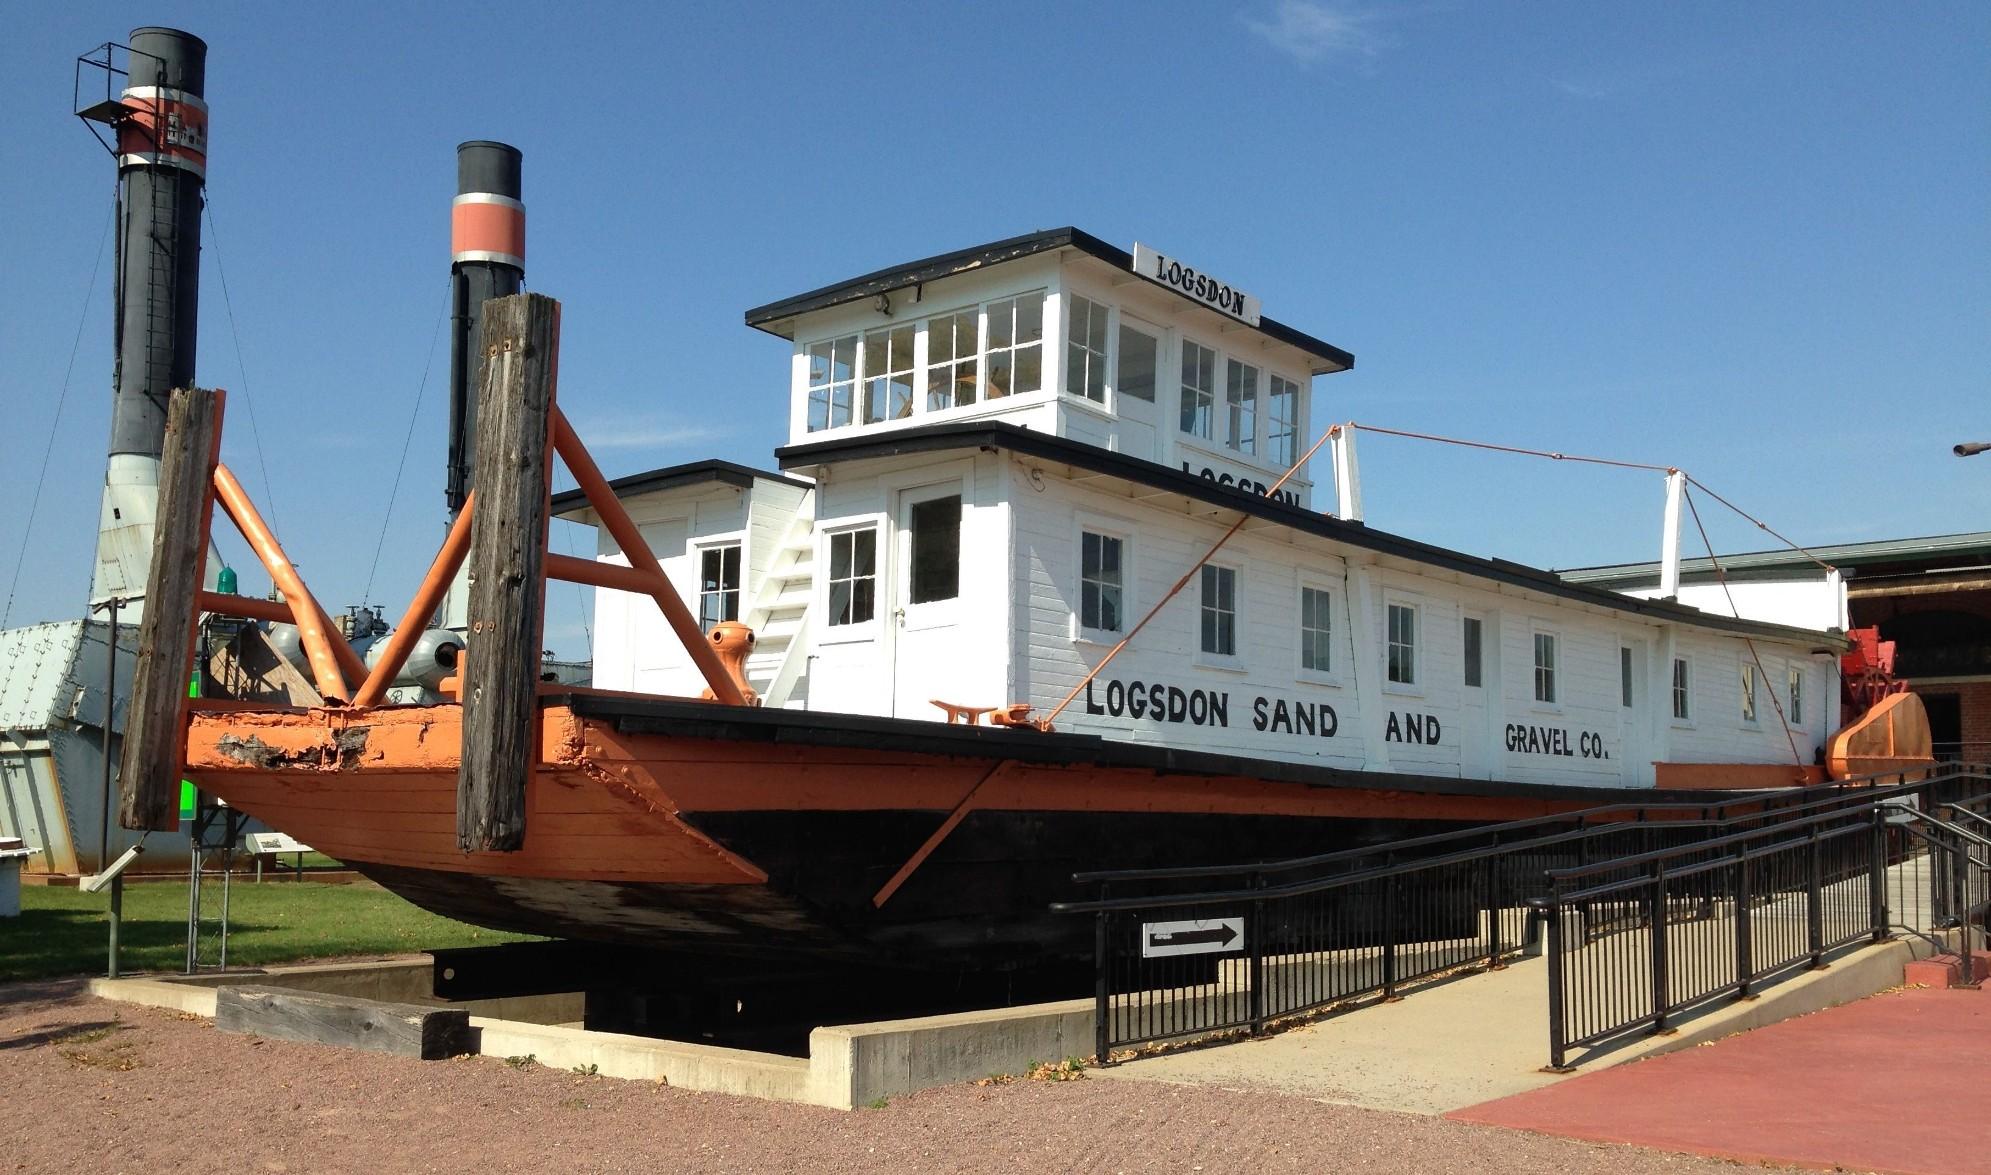 Towboat Logsdon